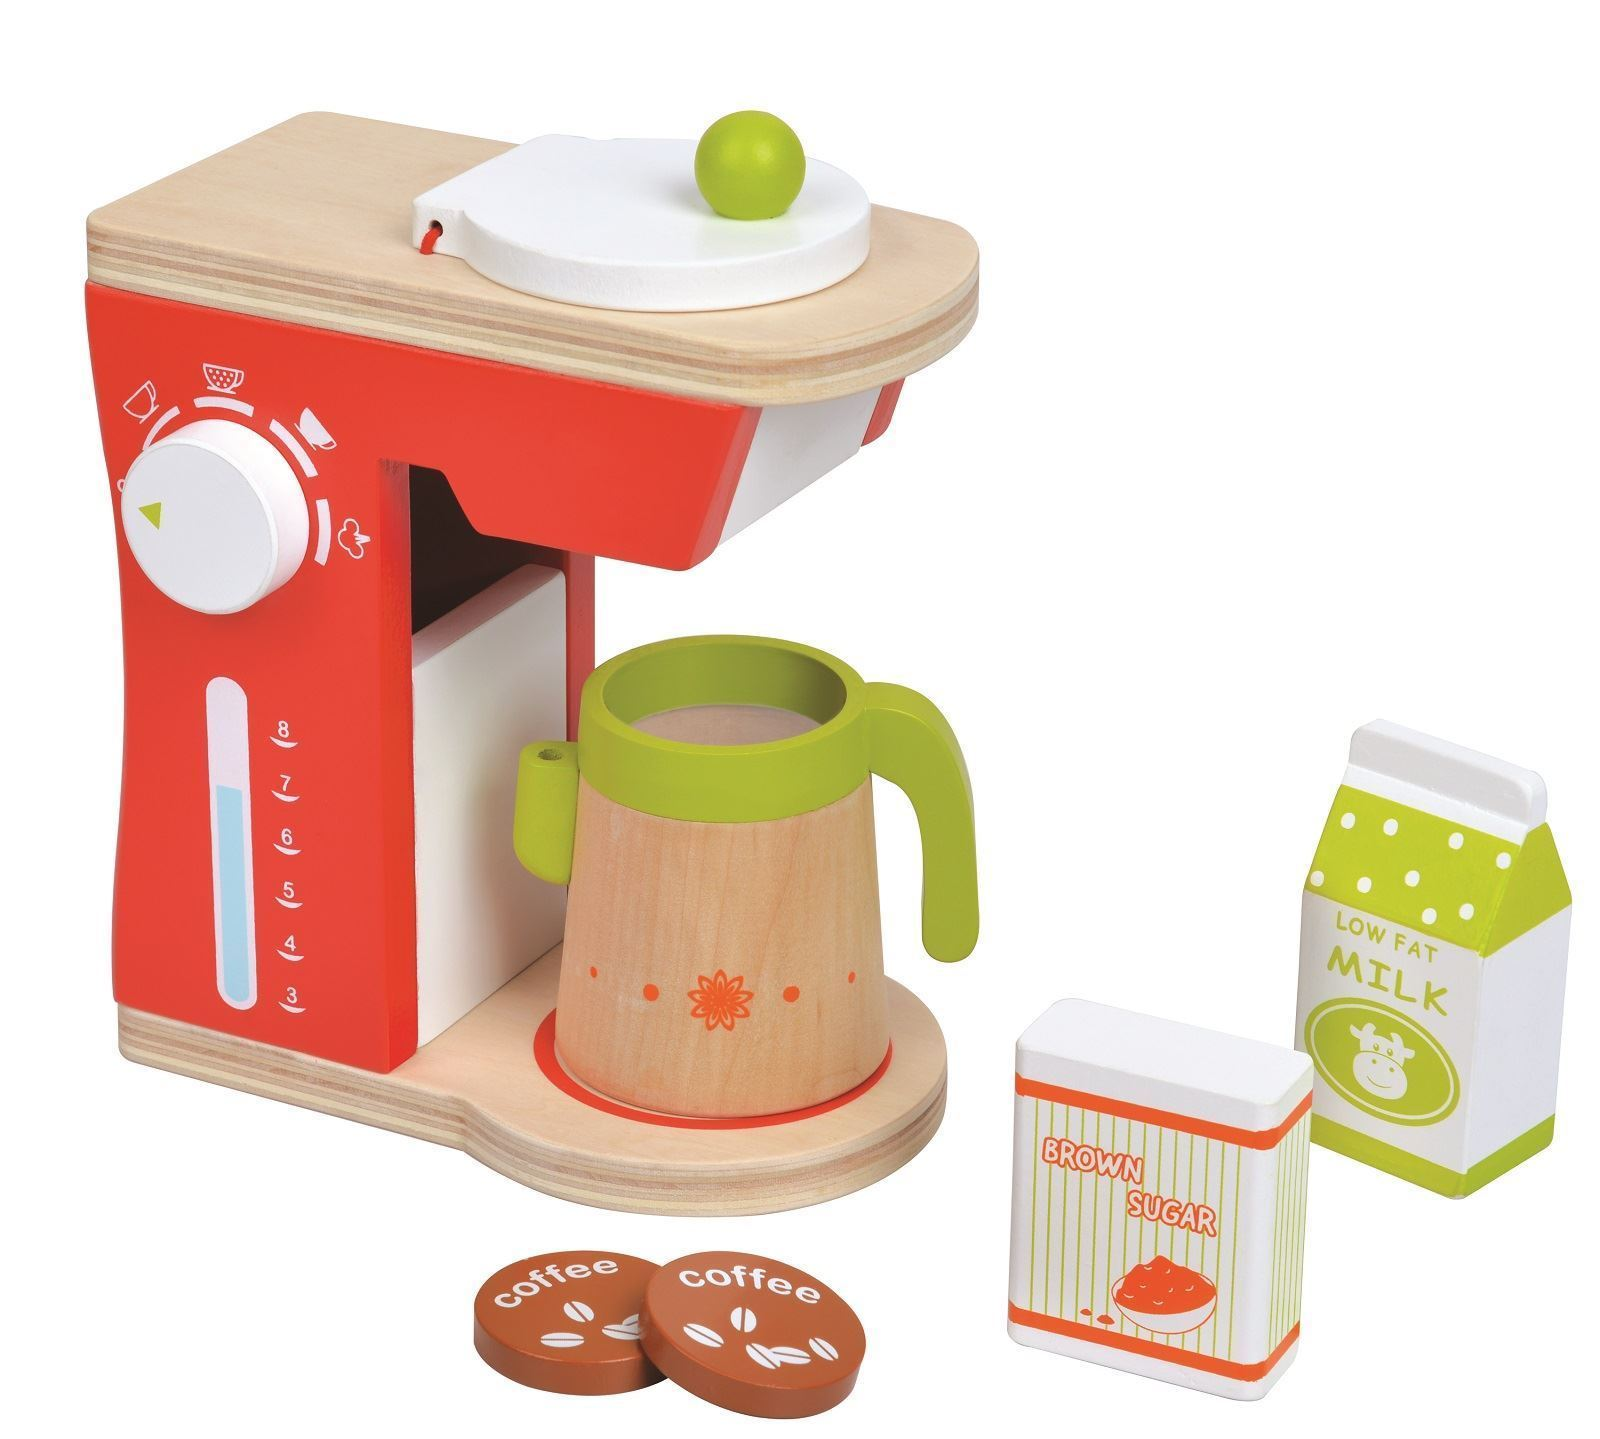 Lelin In Legno Per Bevande Caff 232 T 232 Frullatore Mixer